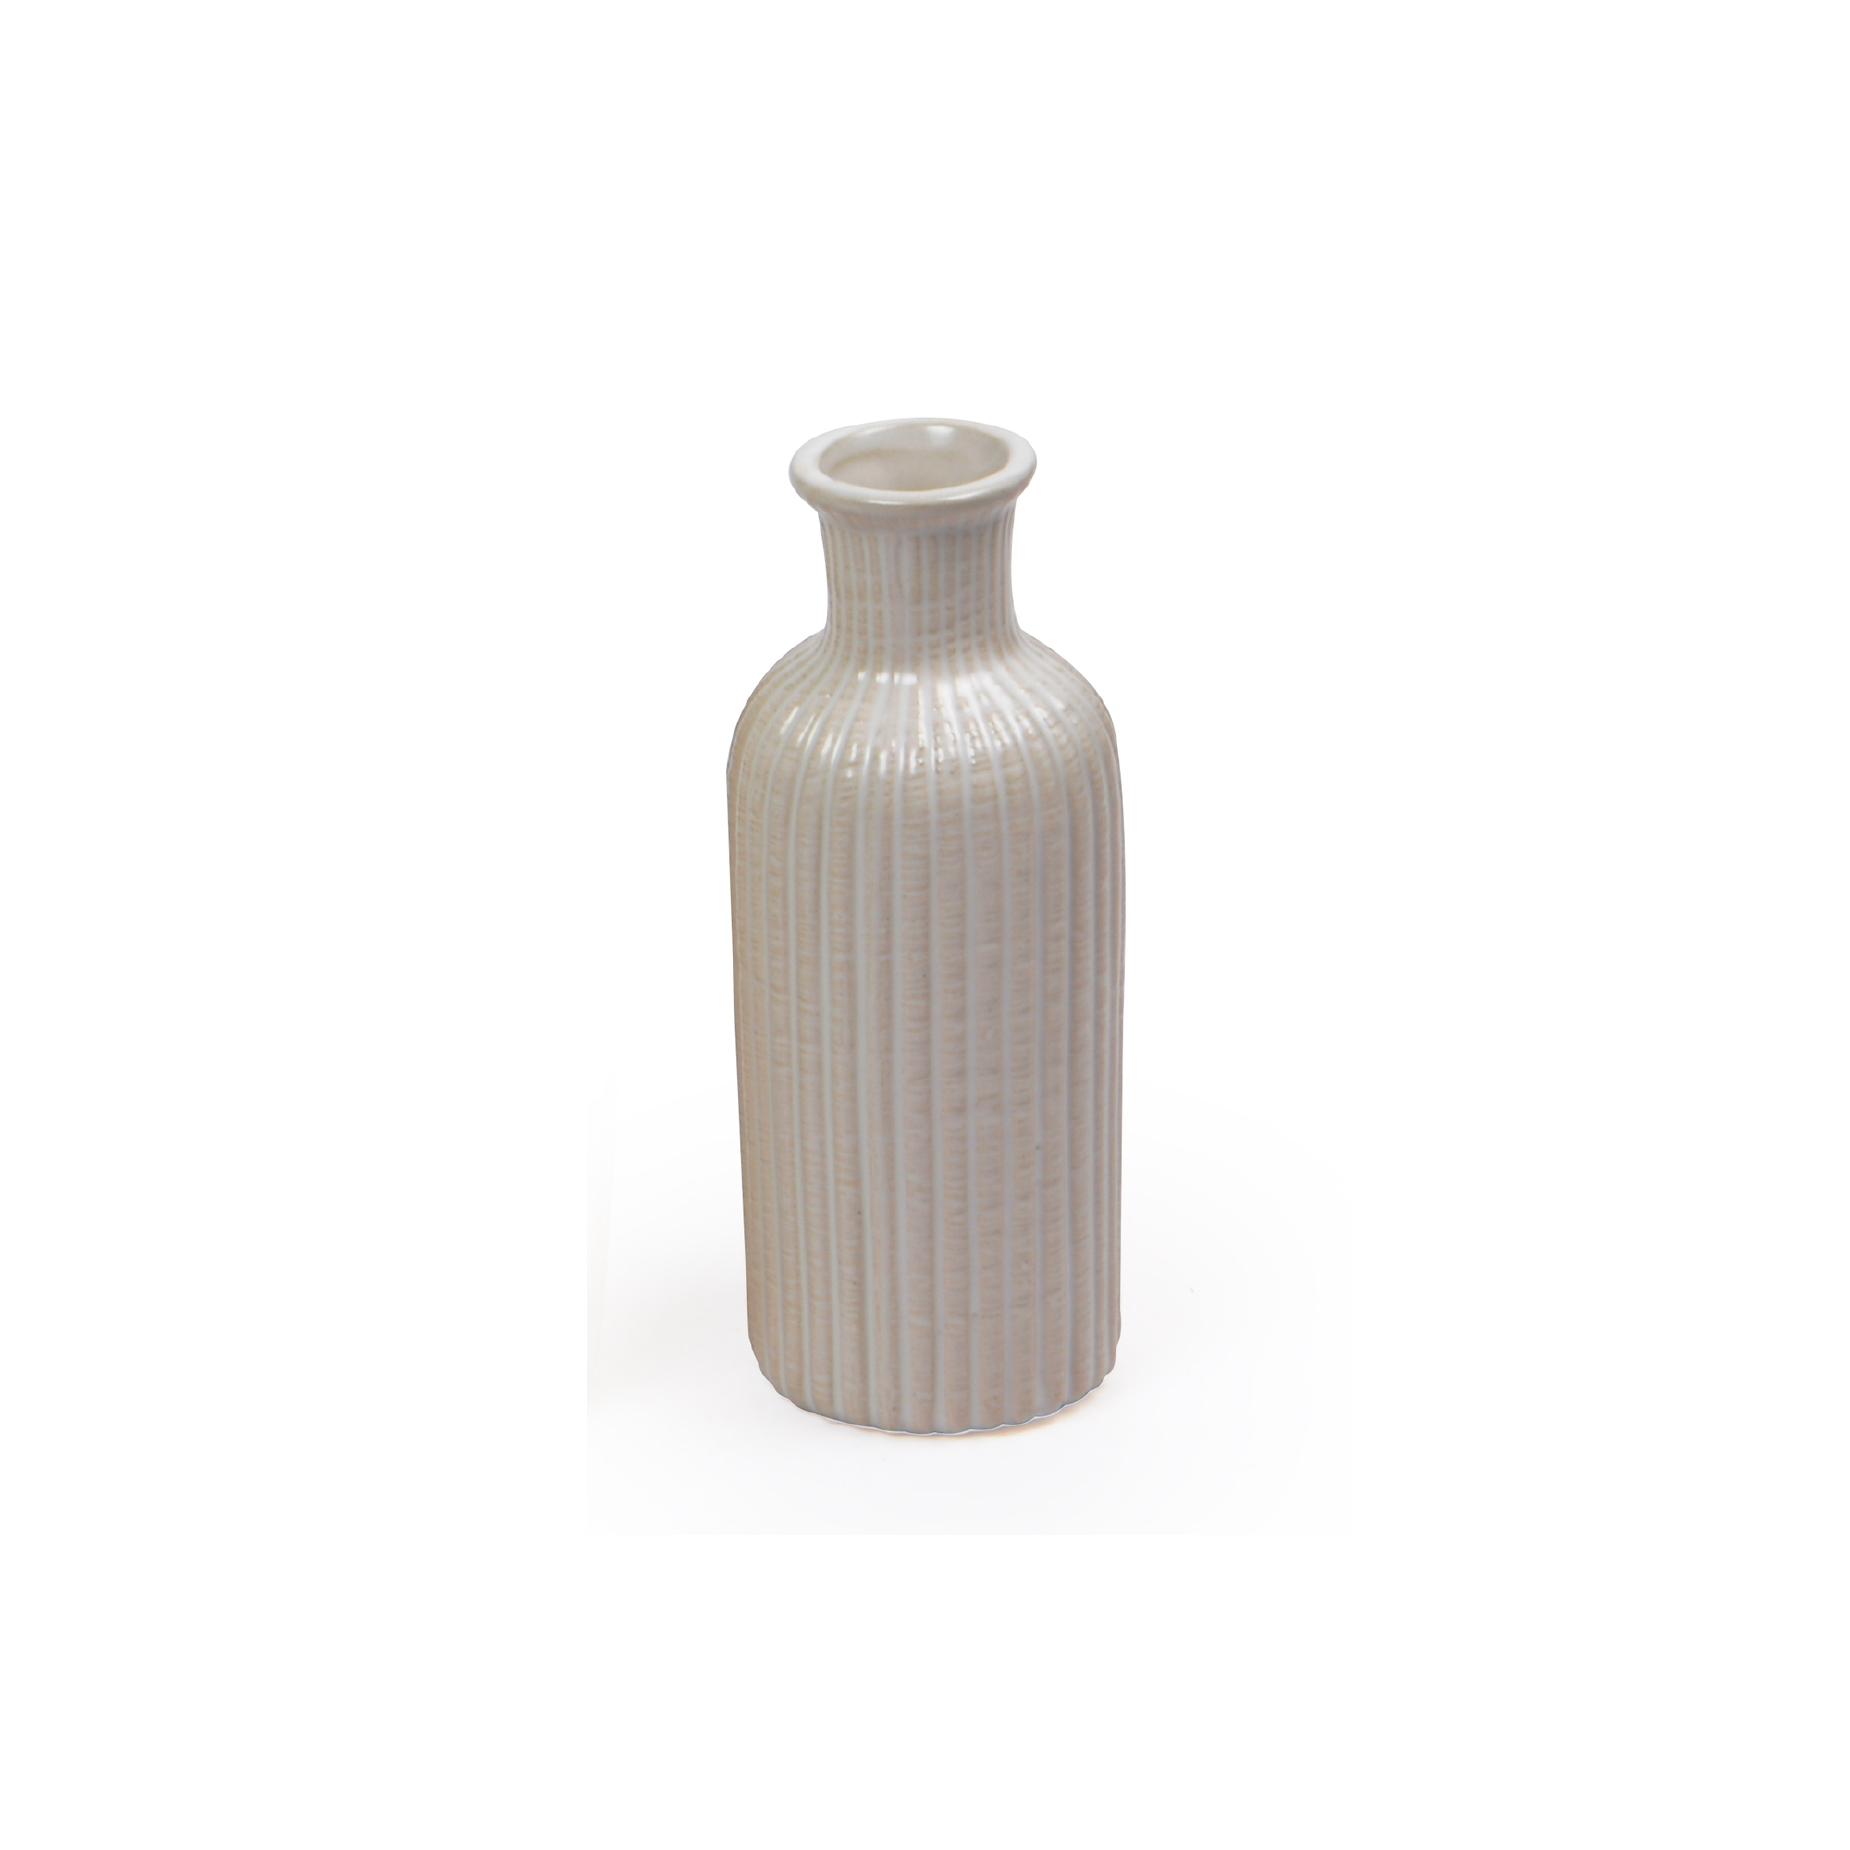 Vaso de cerâmica Branco